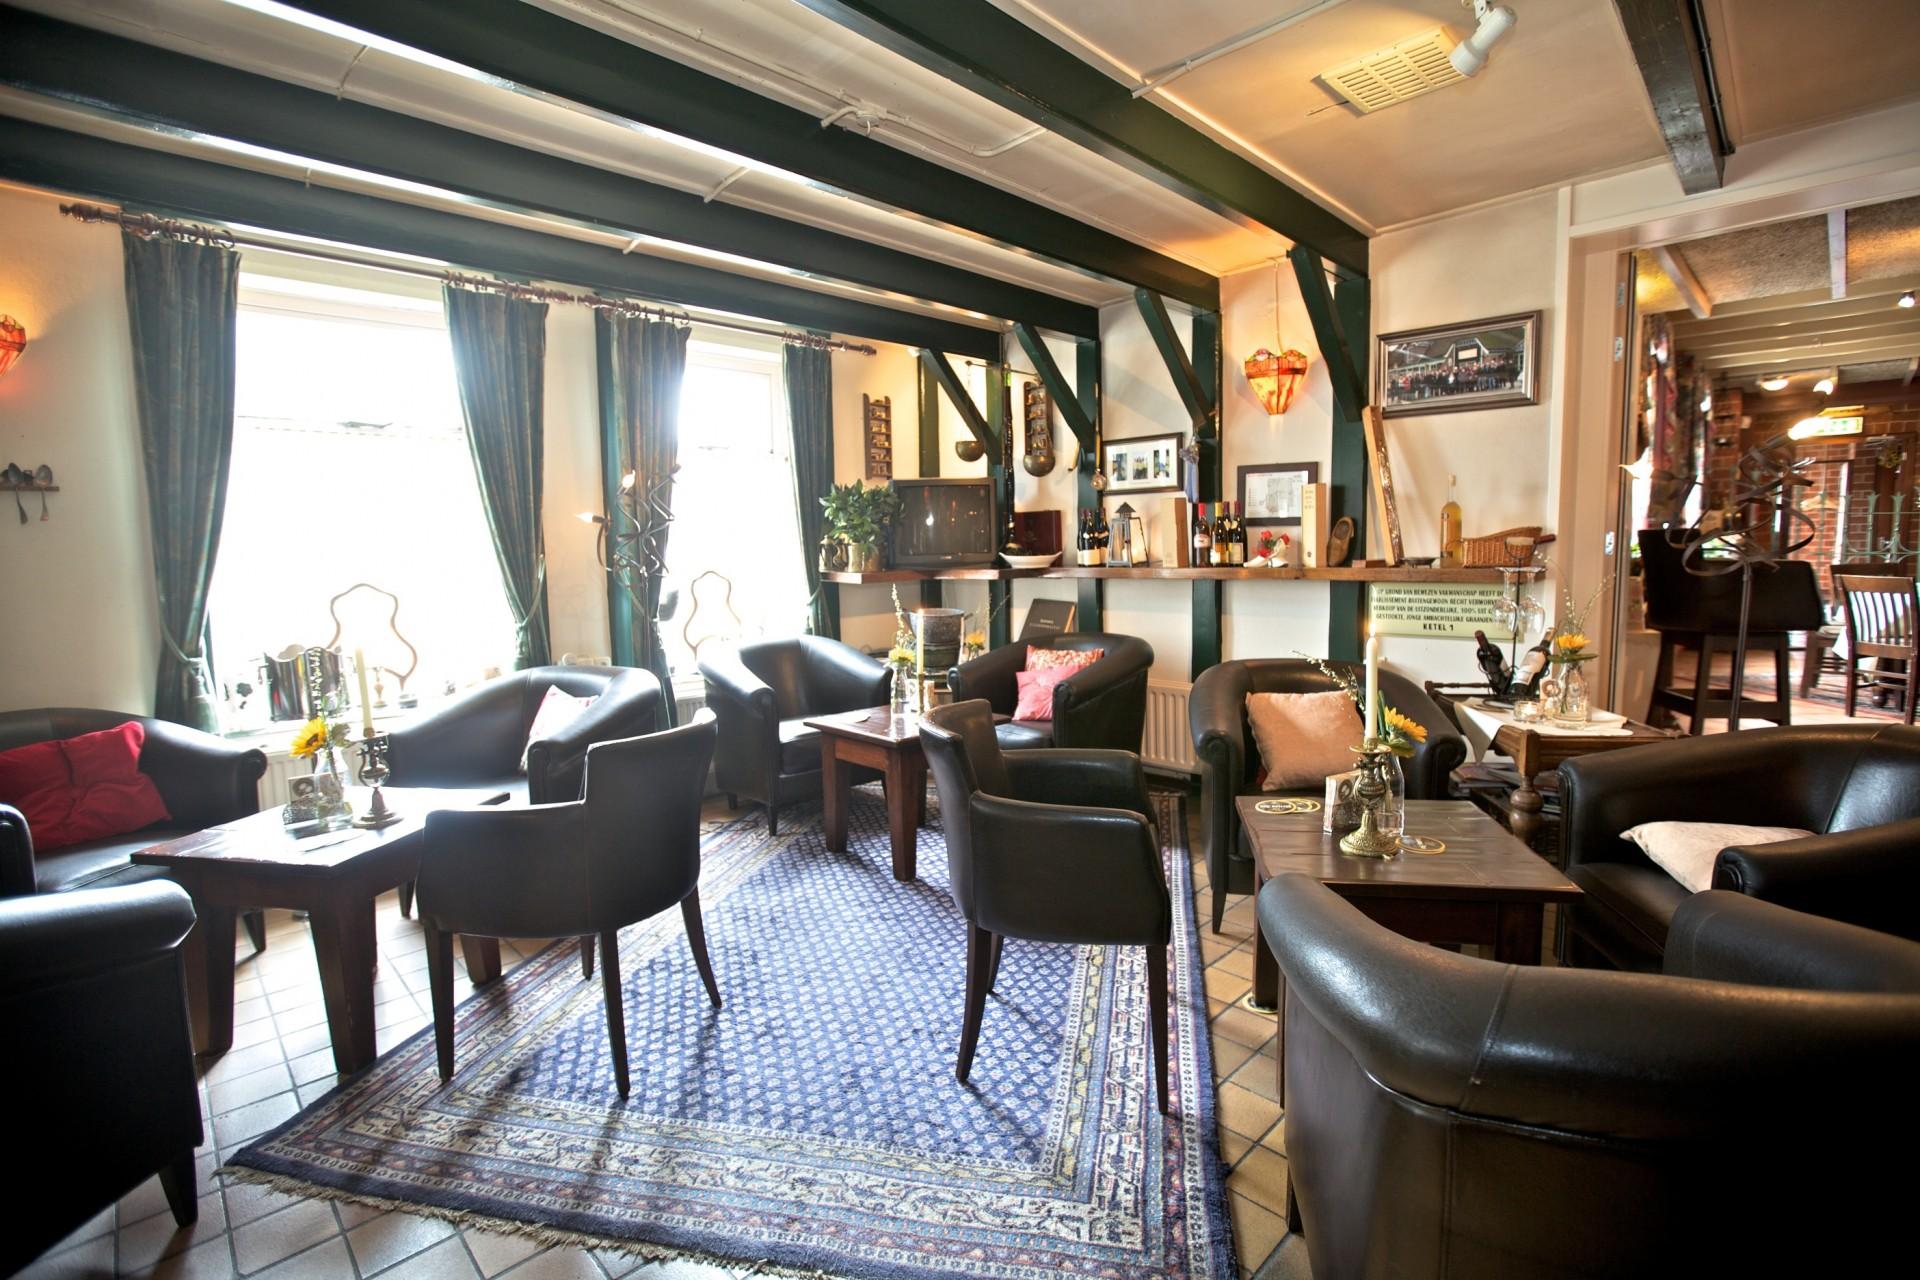 Nadorst-restaurant-uitspanning-faciliteiten-zalen-oude-boerderij-4